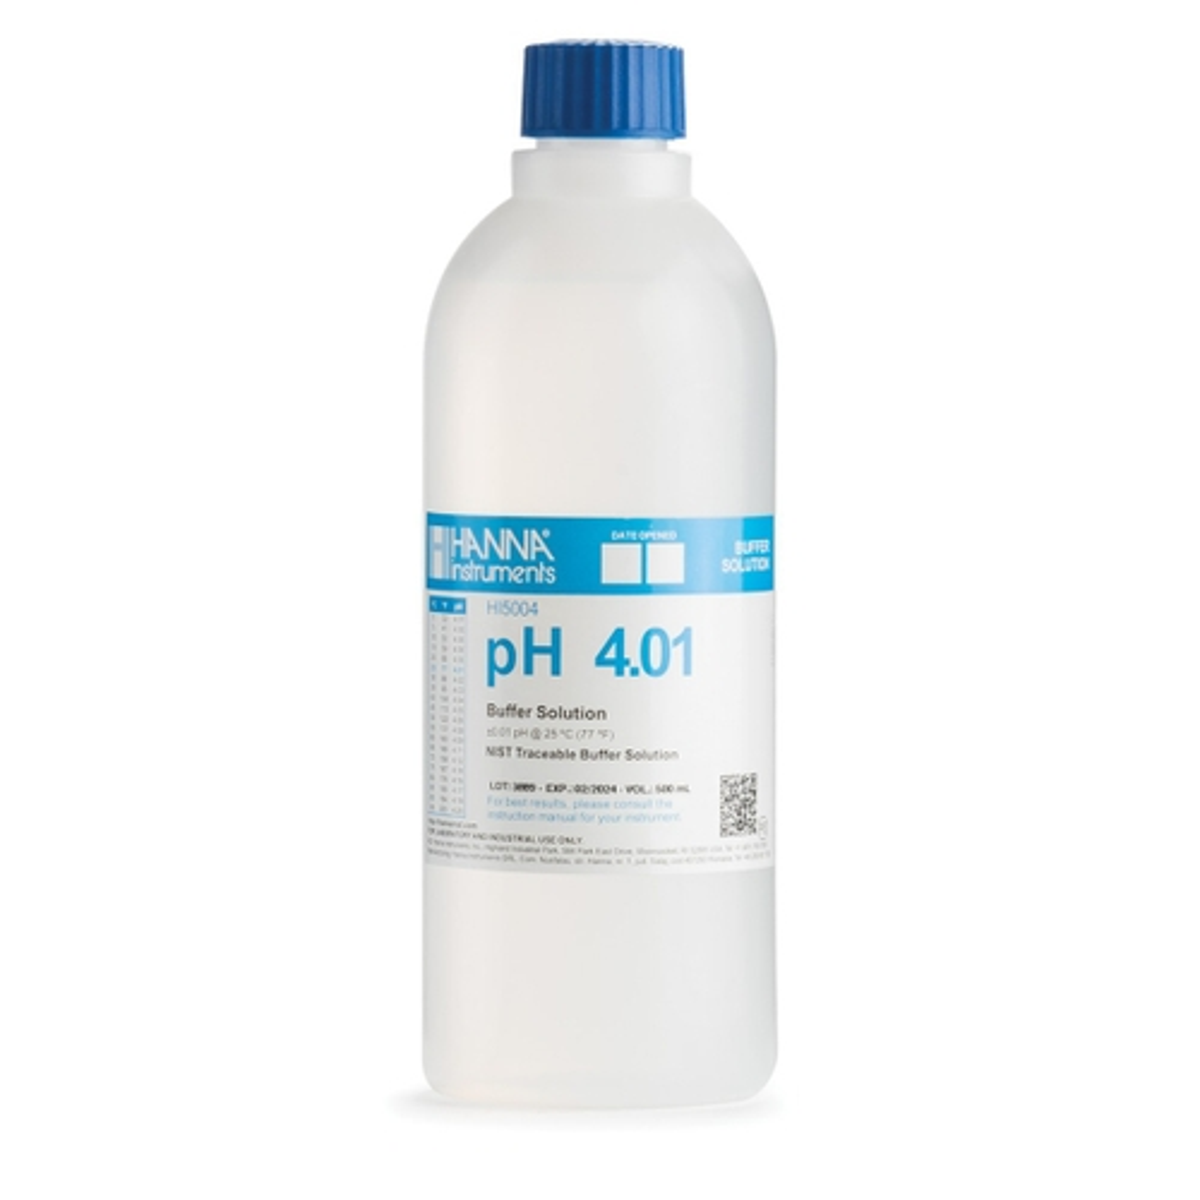 HI5004 pH 4.01 Technical Calibration Buffer (500 mL)